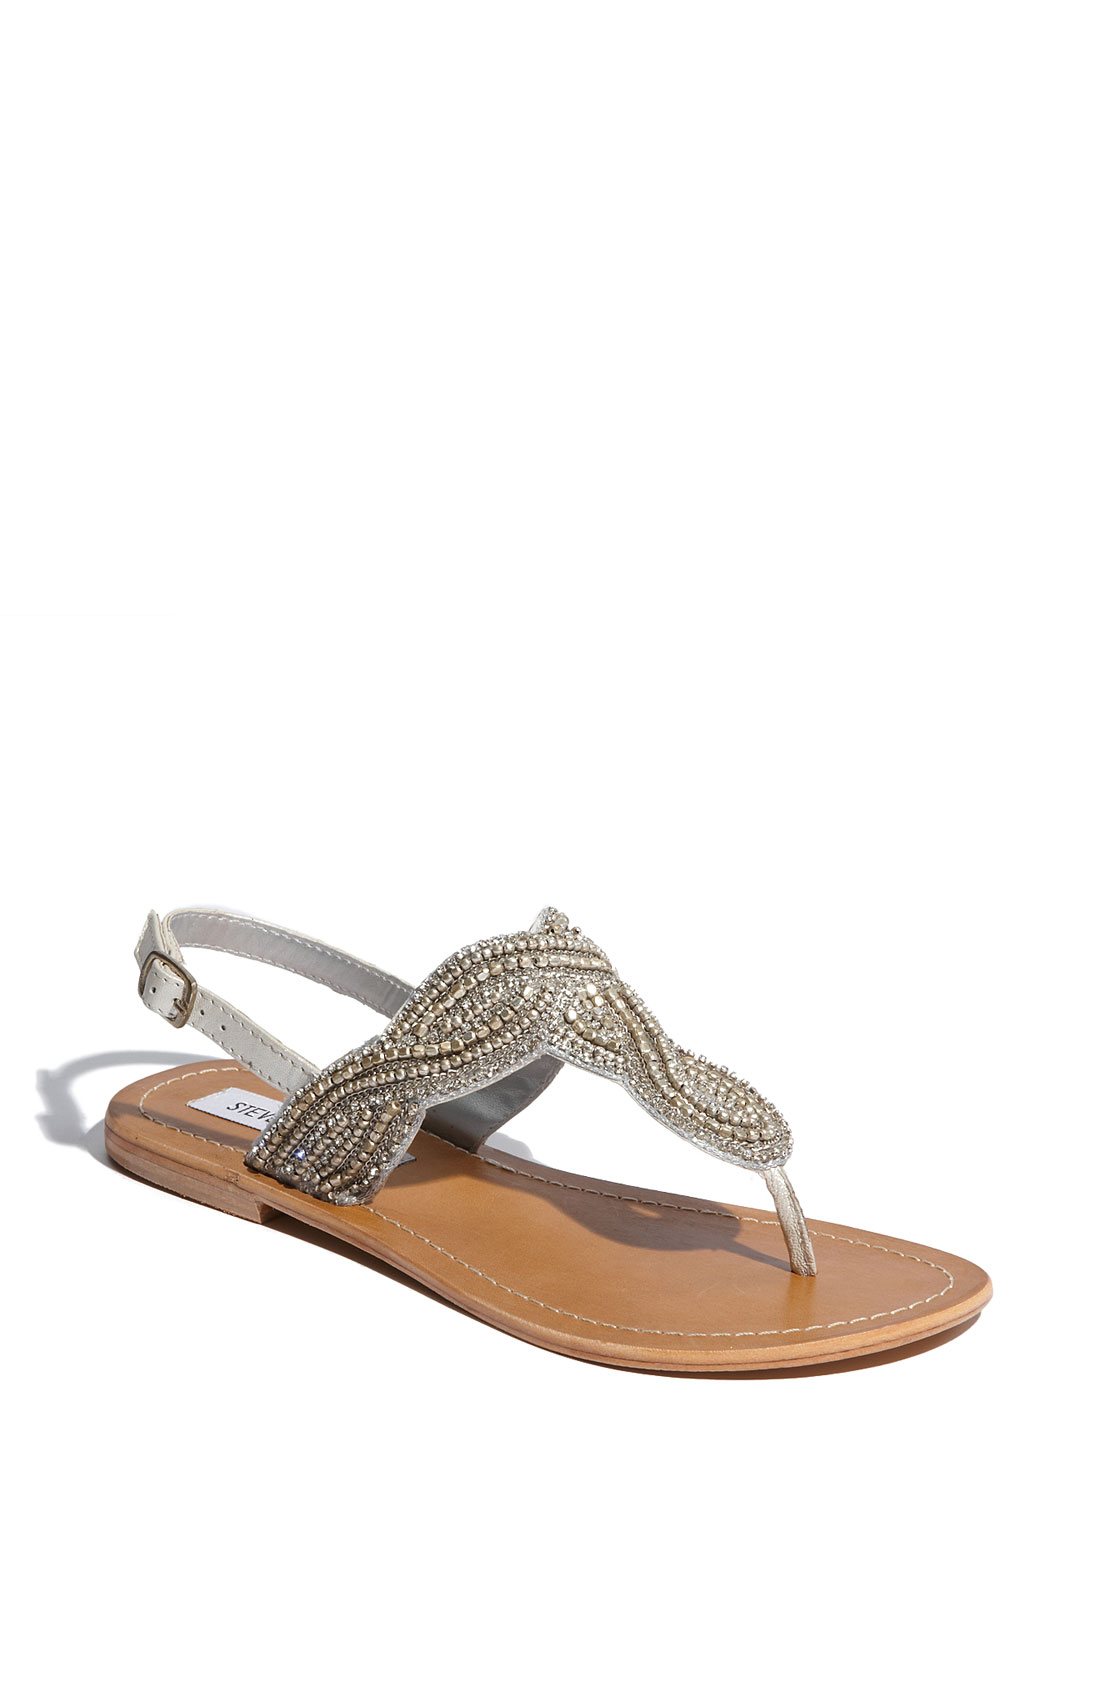 steve madden shiekk rhinestone twist flat sandals in gray pewter lyst